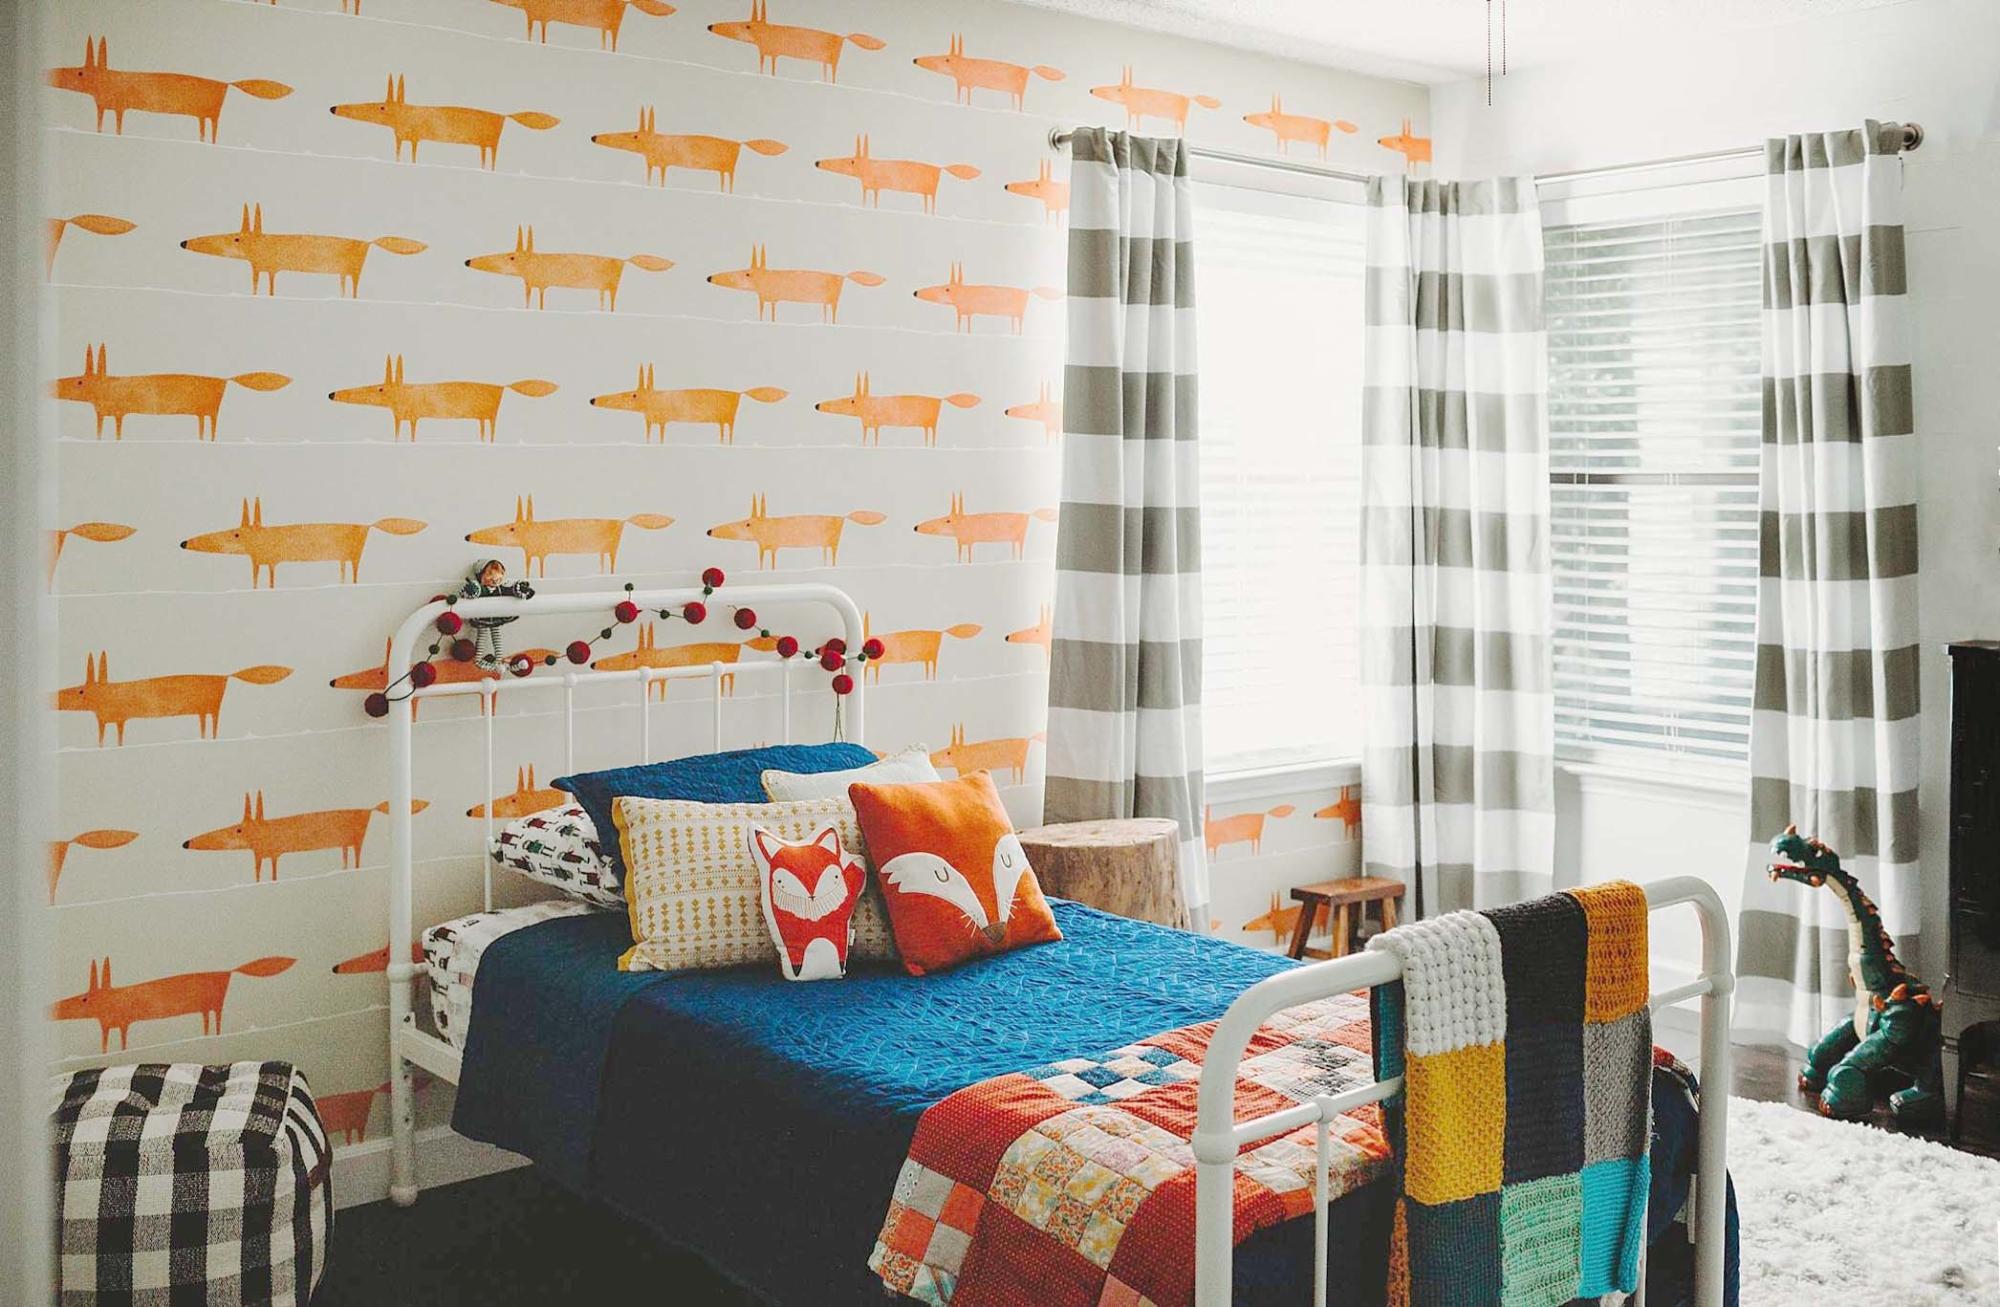 Orange fox wallpaper in kids boys bedroom, headboard wall installation